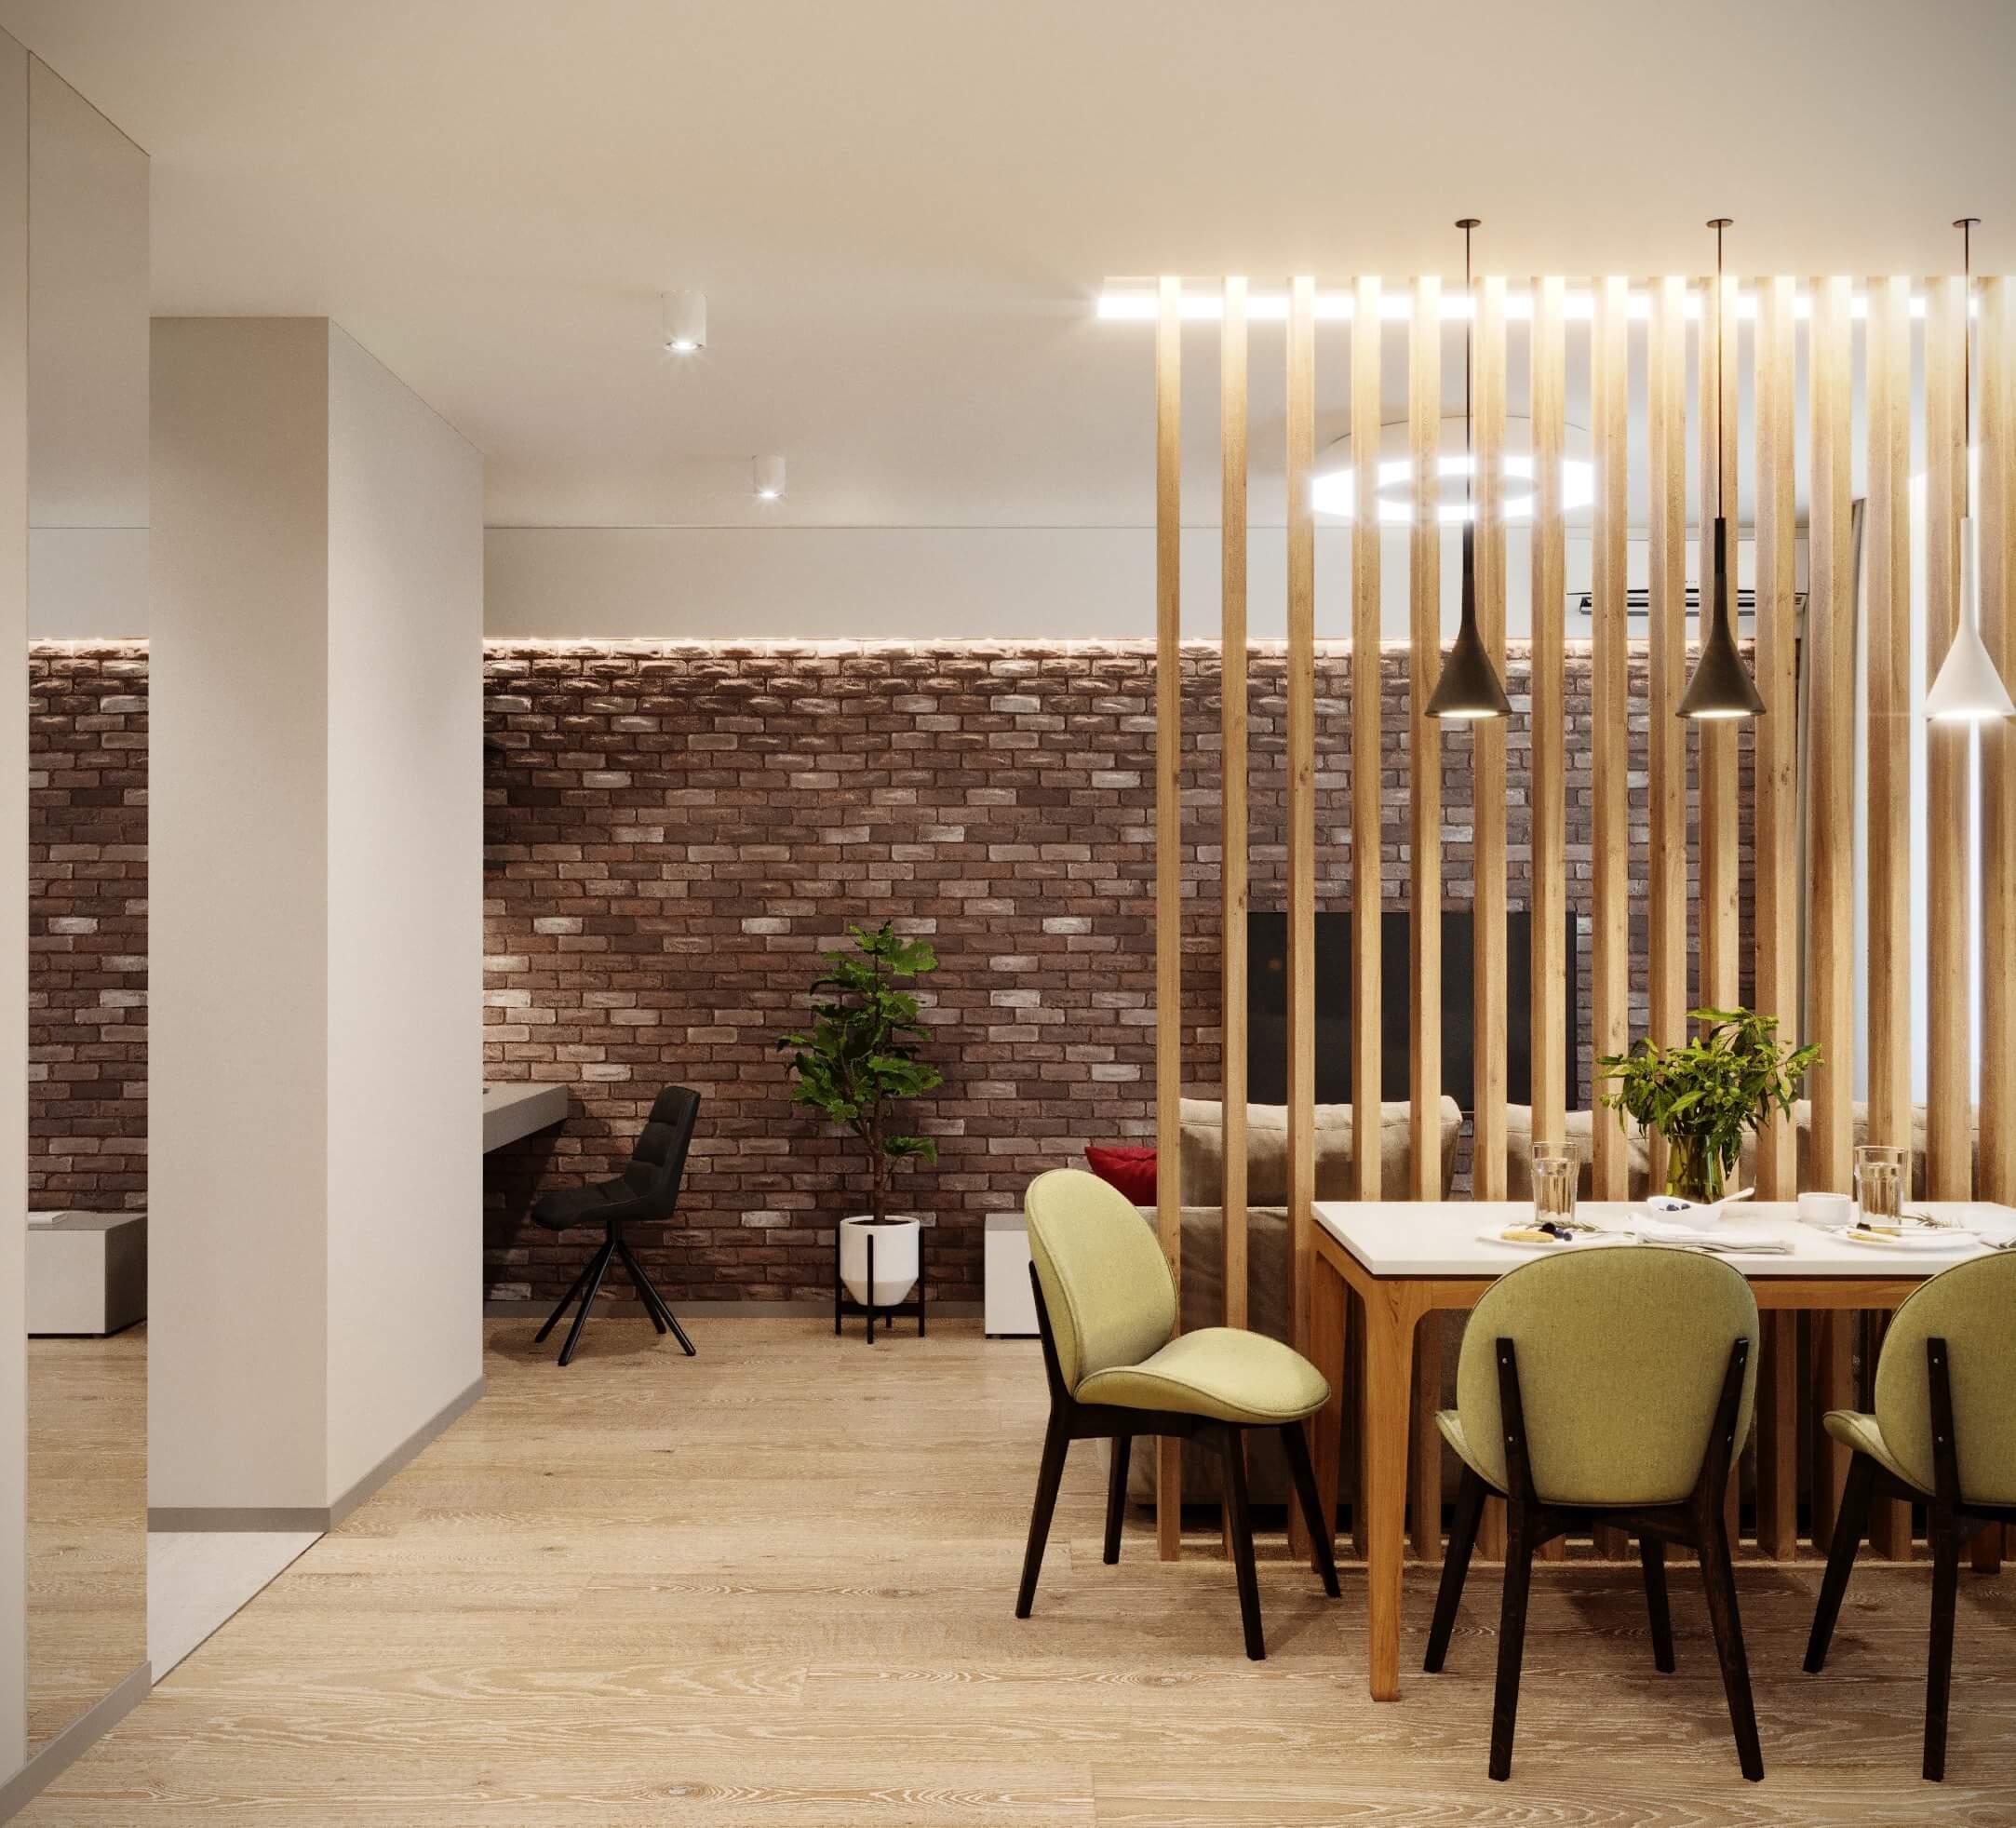 foto realiz - Дизайн интерьера 1-2 комнатной квартиры 45 кв м